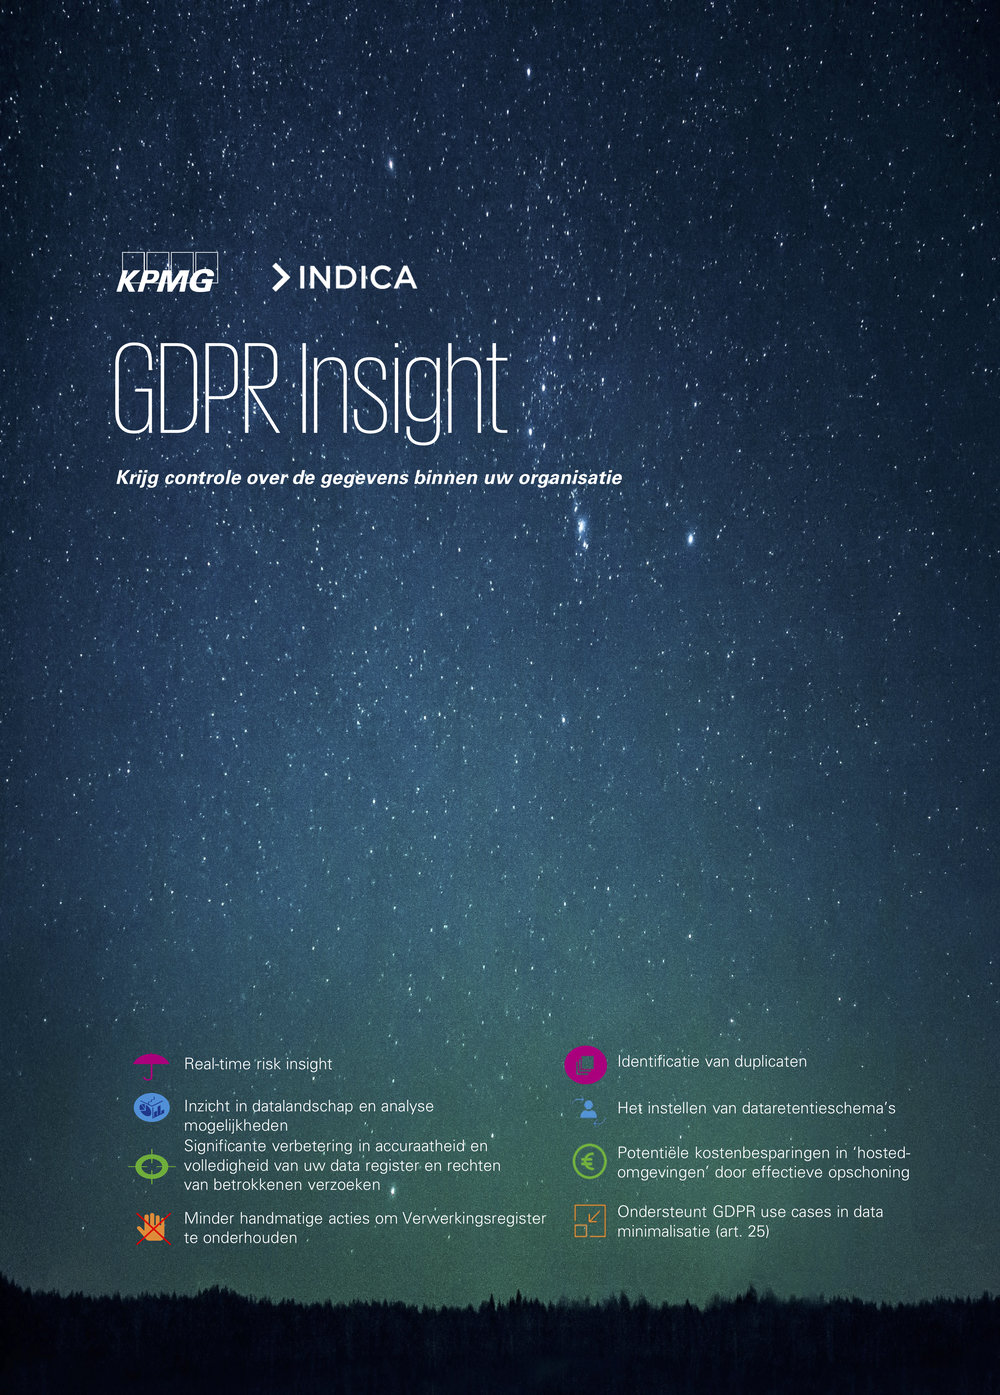 INDICA : KPMG Brochure_page 1.jpg